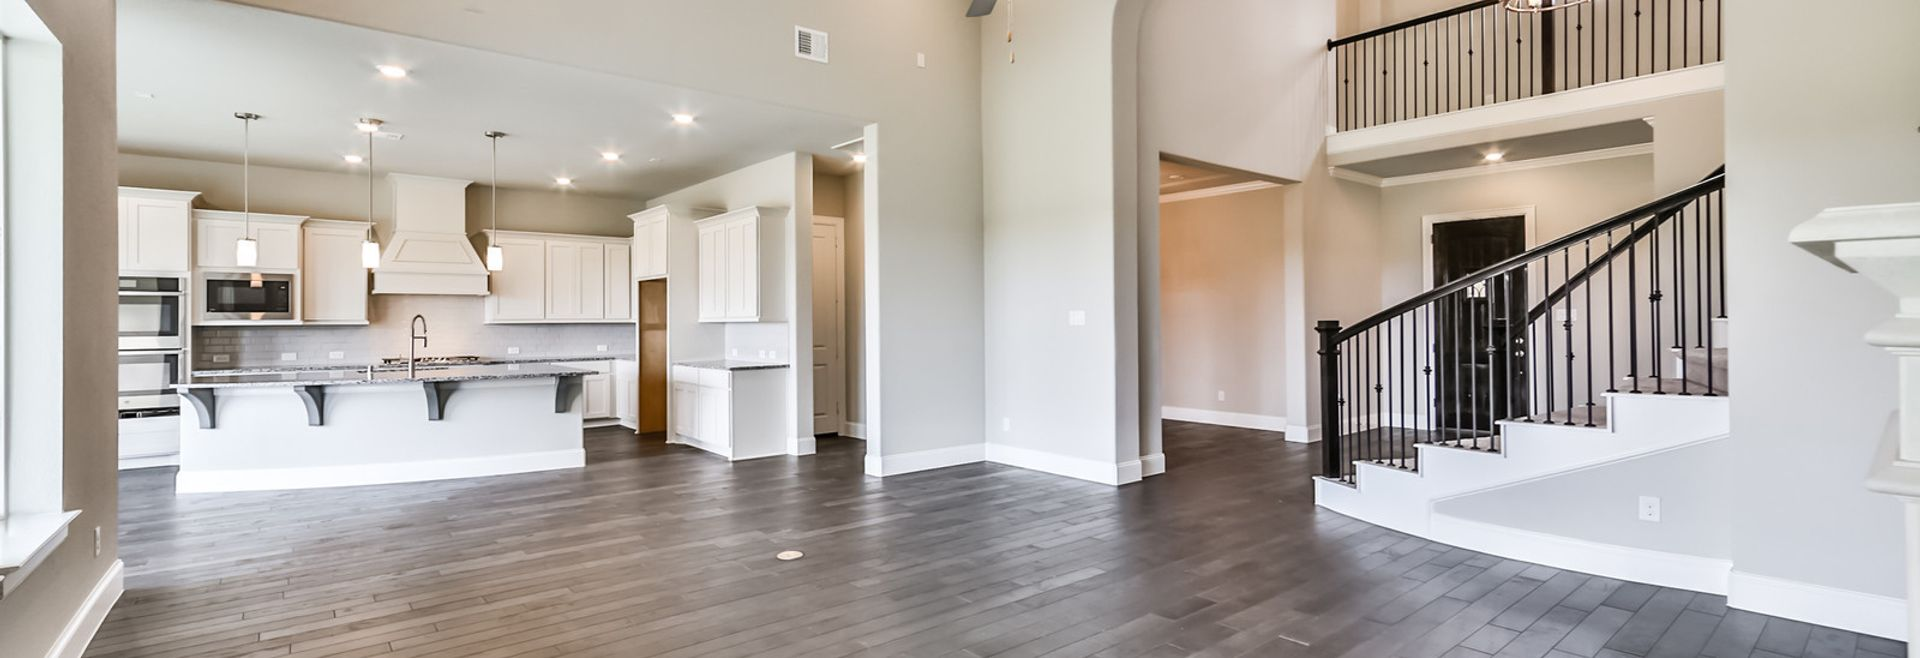 Plan 6050 Kitchen/Living Area